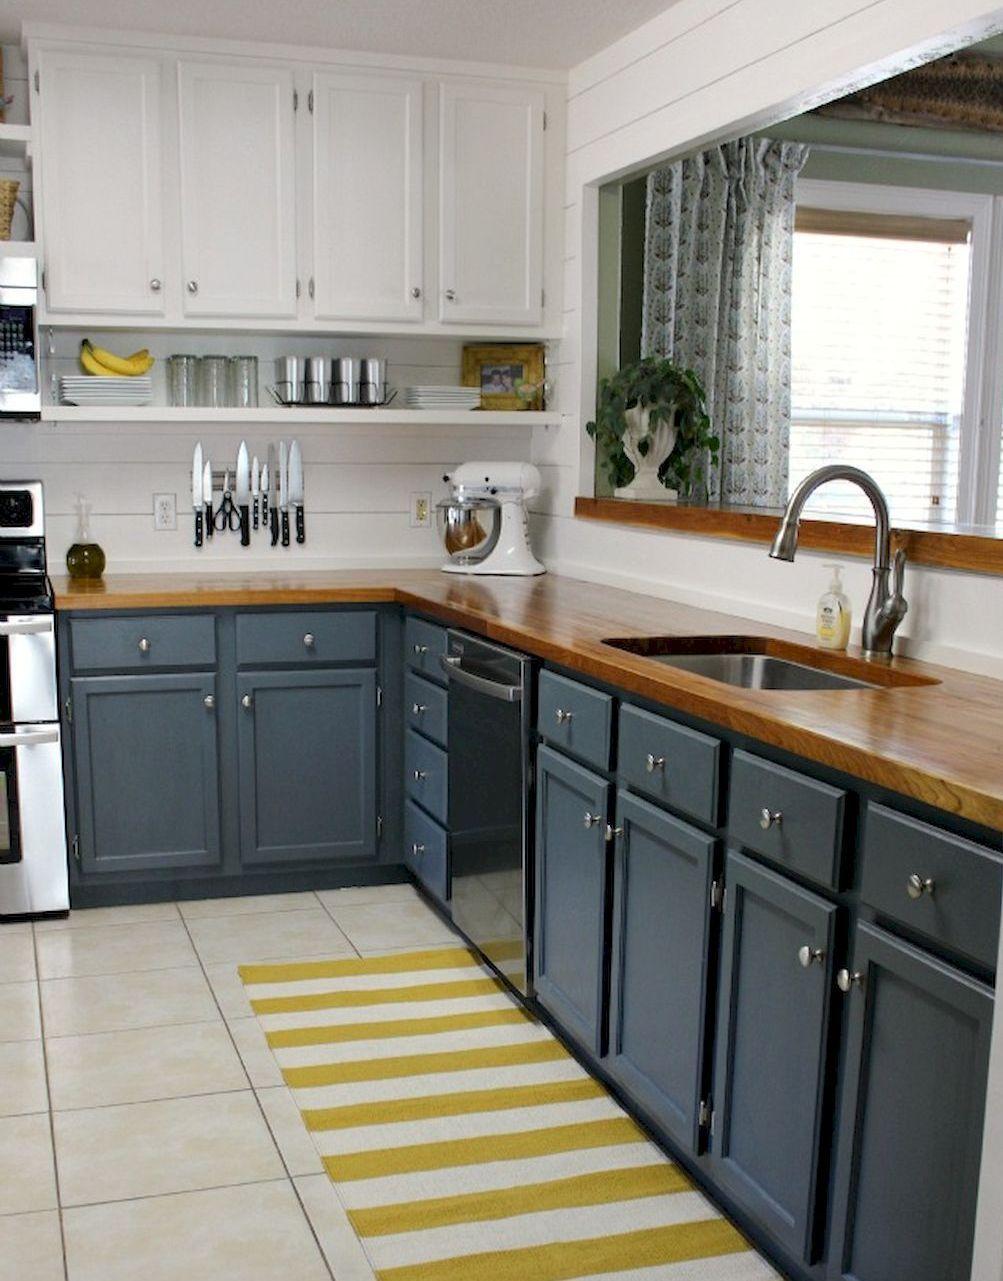 50 Fabulous Apartment Kitchen Cabinets Decor Ideas Apartment Kitchen Kitchen Remodel Small Grey Kitchen Designs Kitchen Design